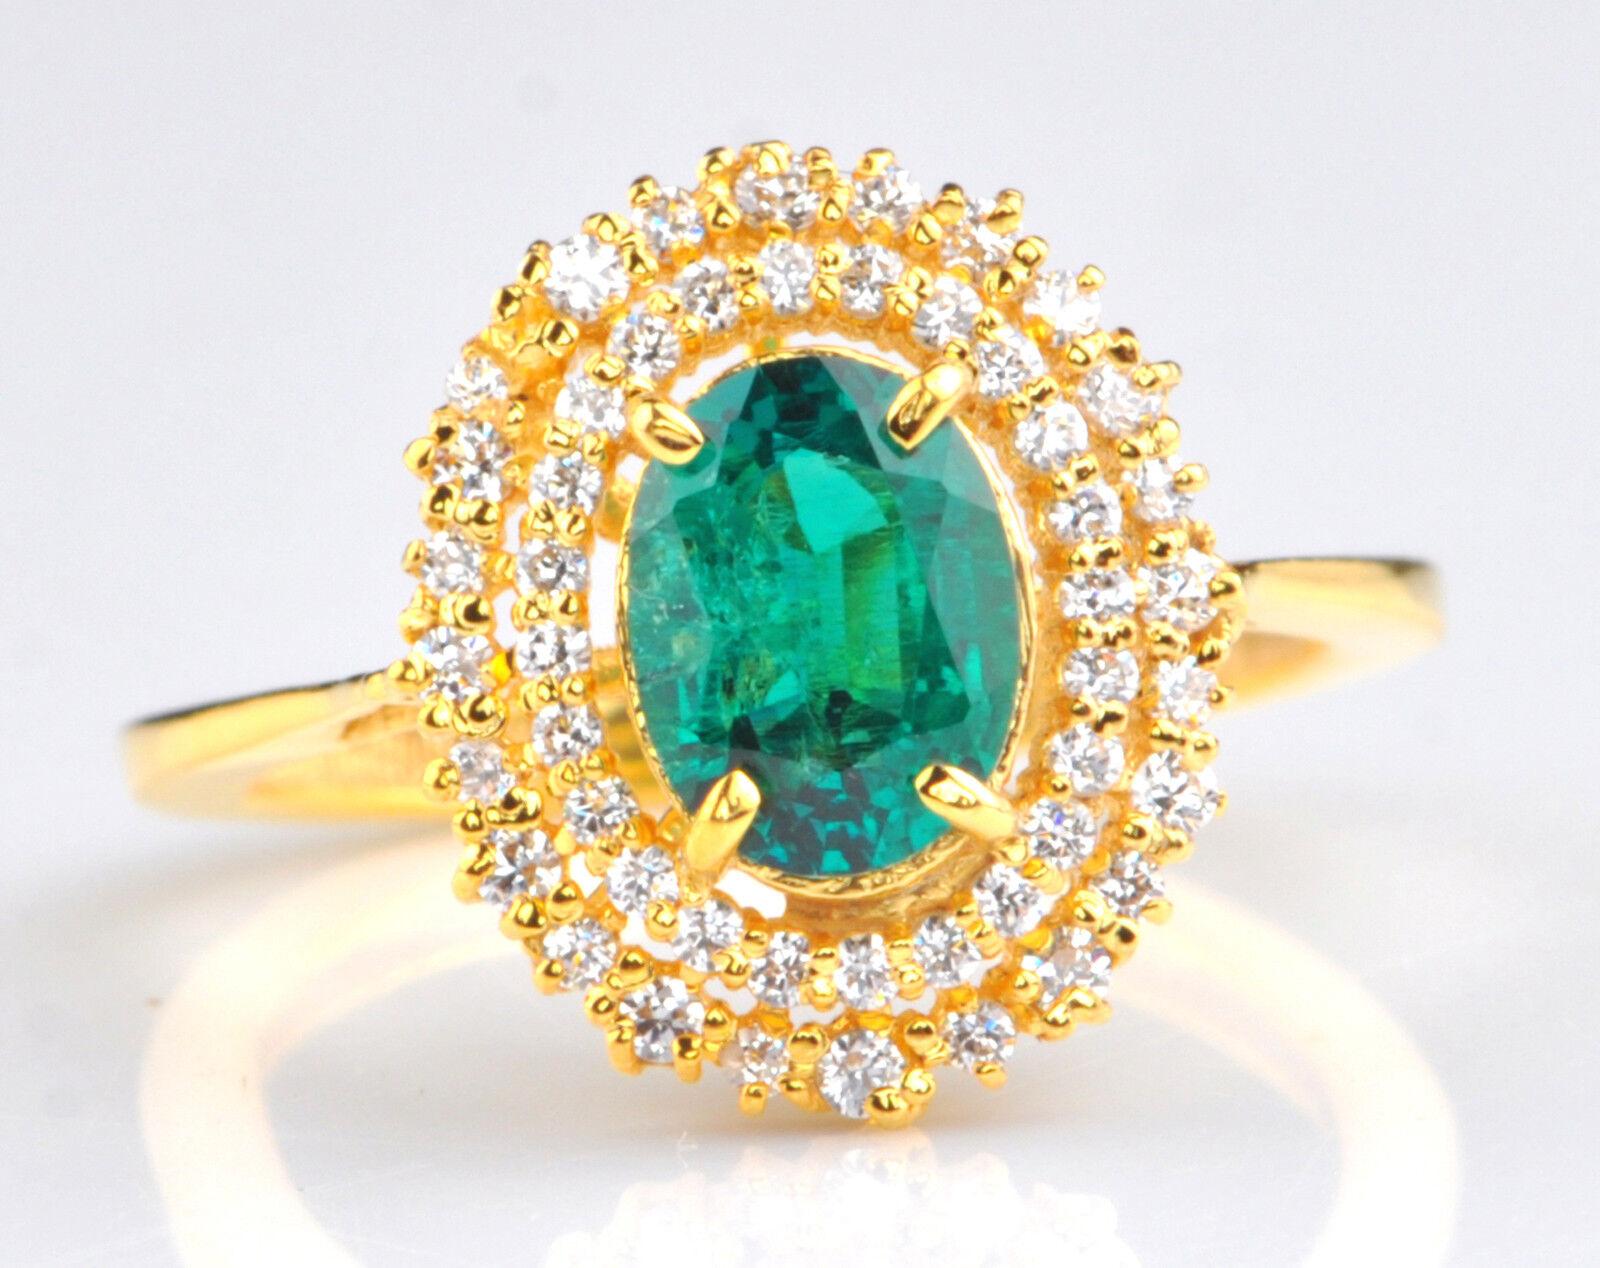 14KT Yellow gold 1.45 Carat Natural Green Emerald EGL Certified Diamond Ring